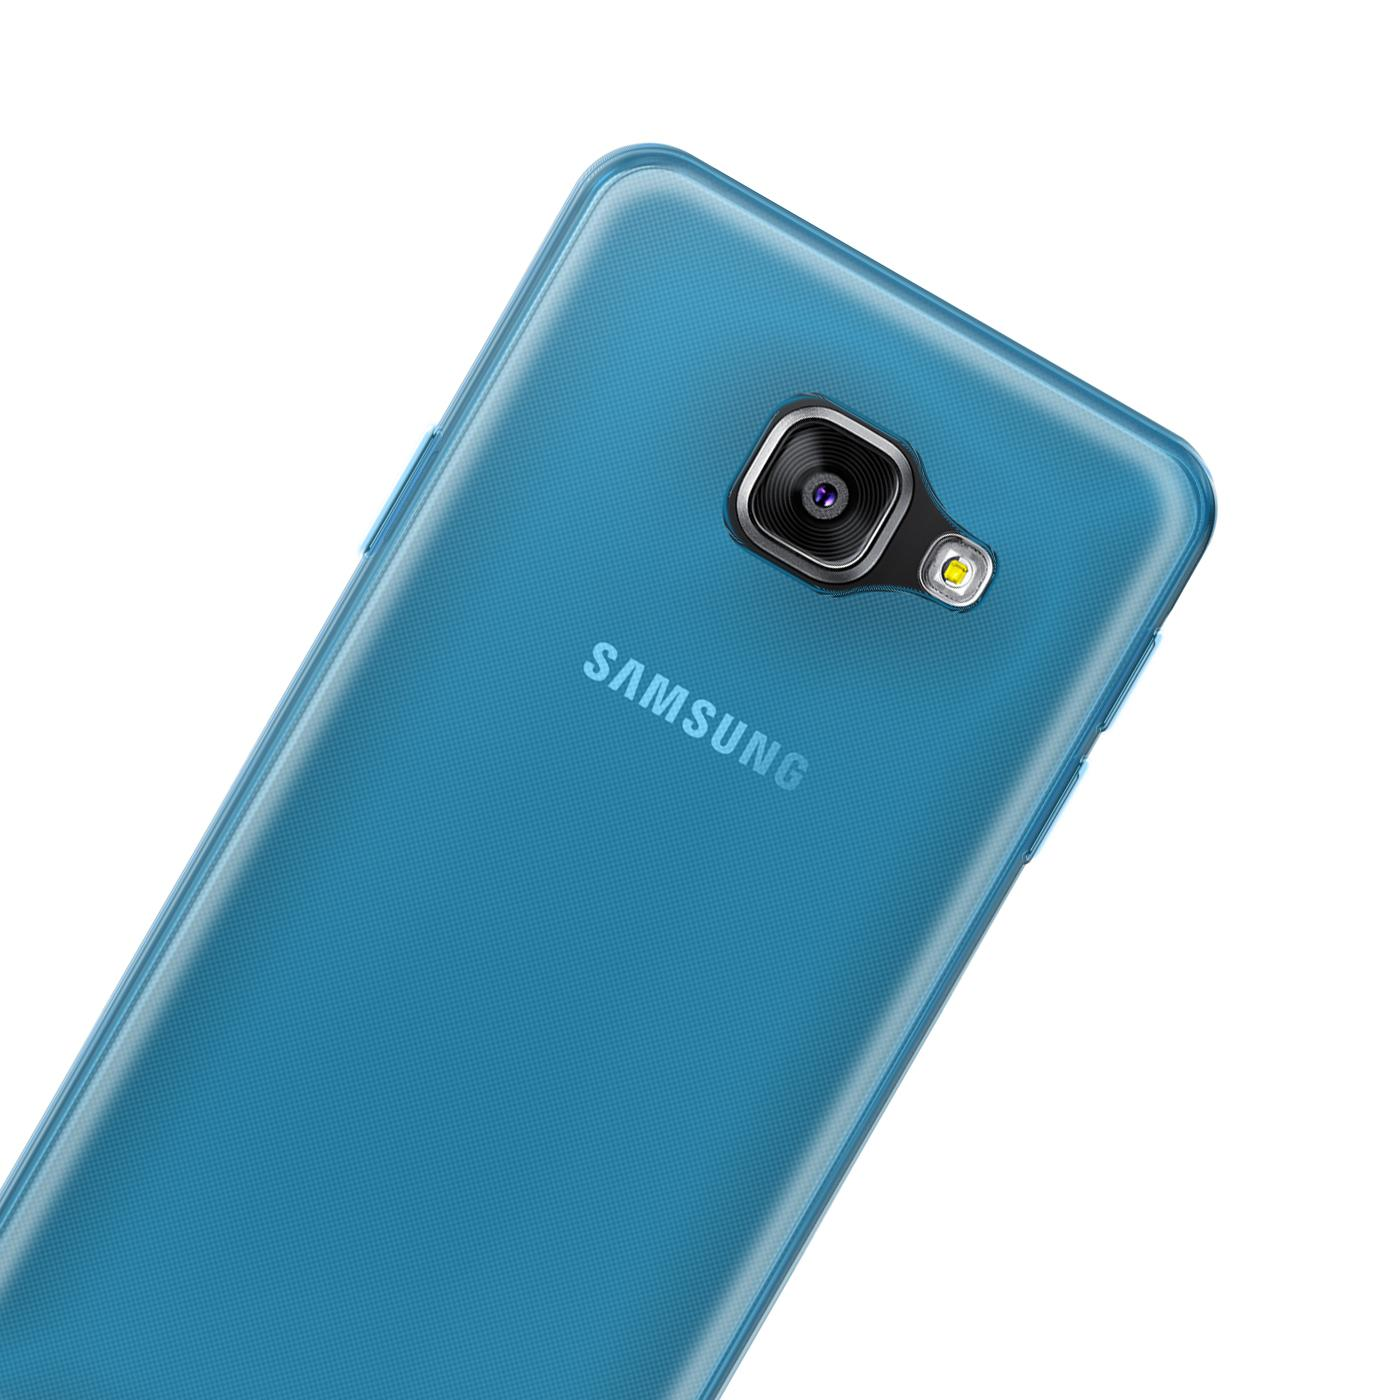 Samsung-Galaxy-a3-2016-Thin-Silikon-Klar-Case-Cover-Ultra-Slim-Stossfeste-Gel Indexbild 10